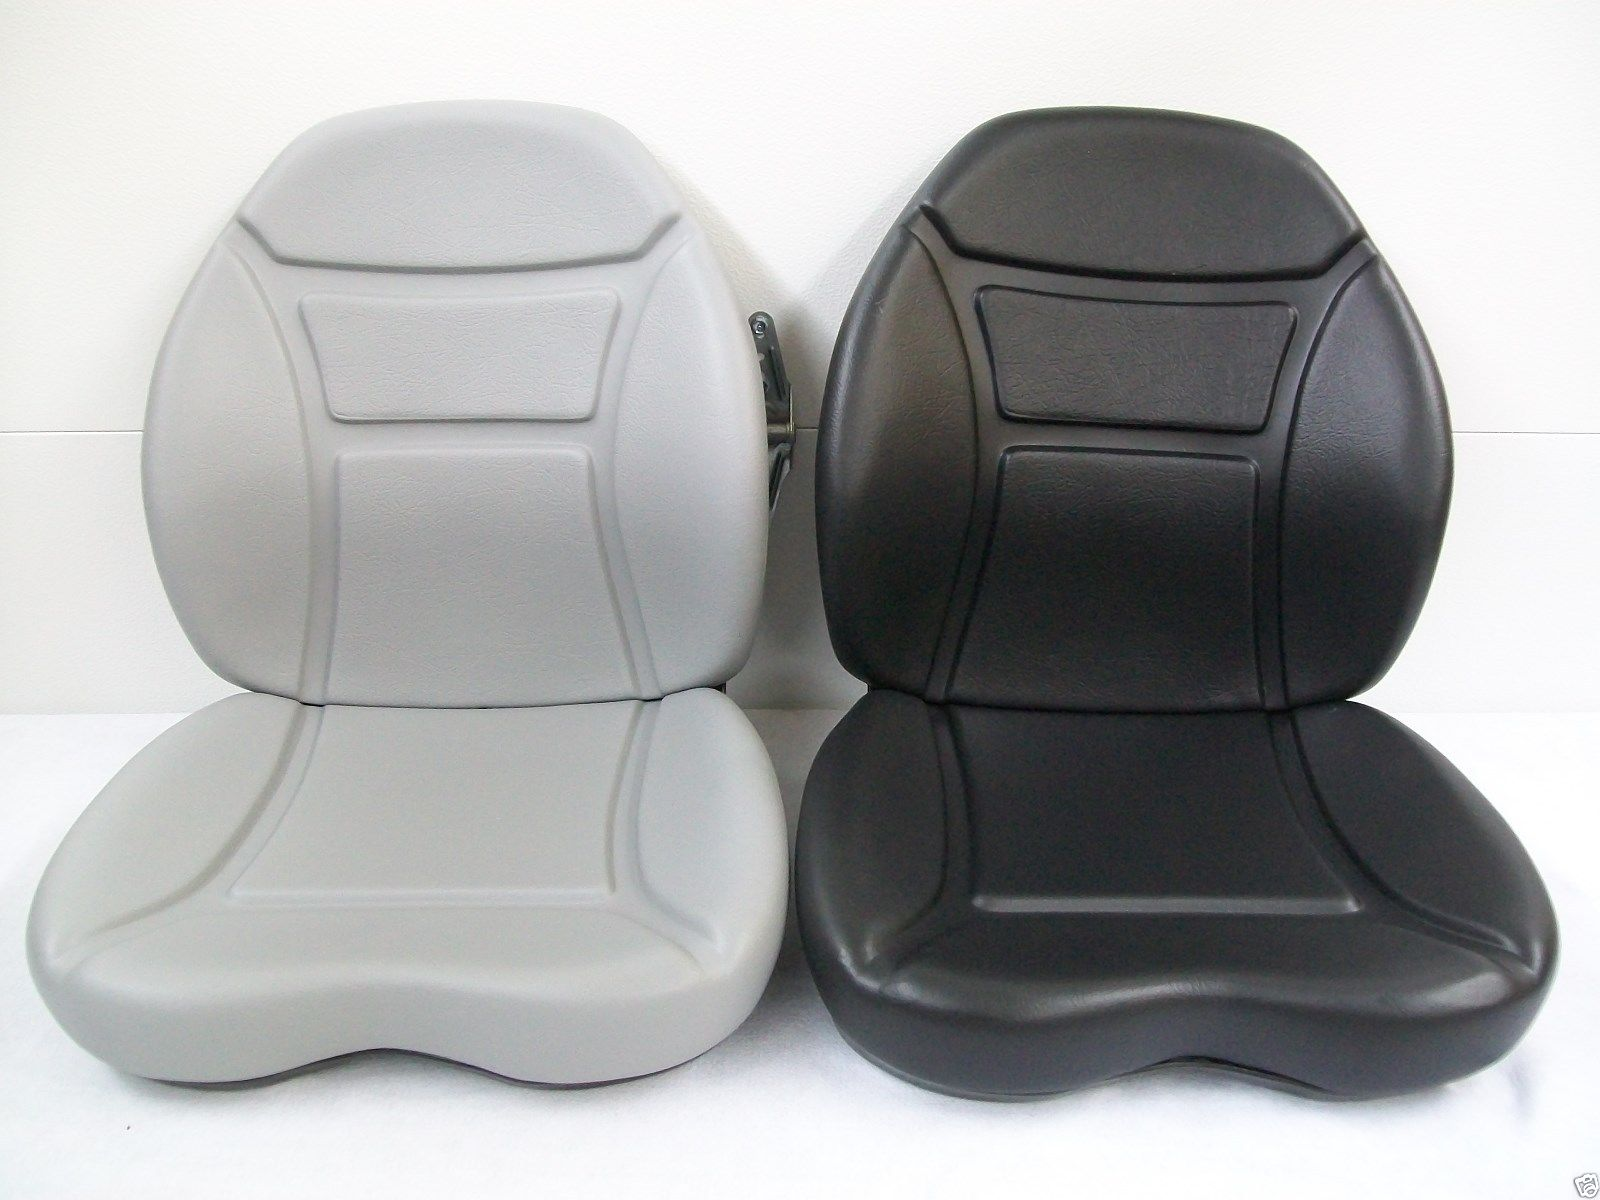 BLACK, GRAY SEAT CUSHION KIT, SUSPENSION SEAT, NEW HOLLAND LS170 ...